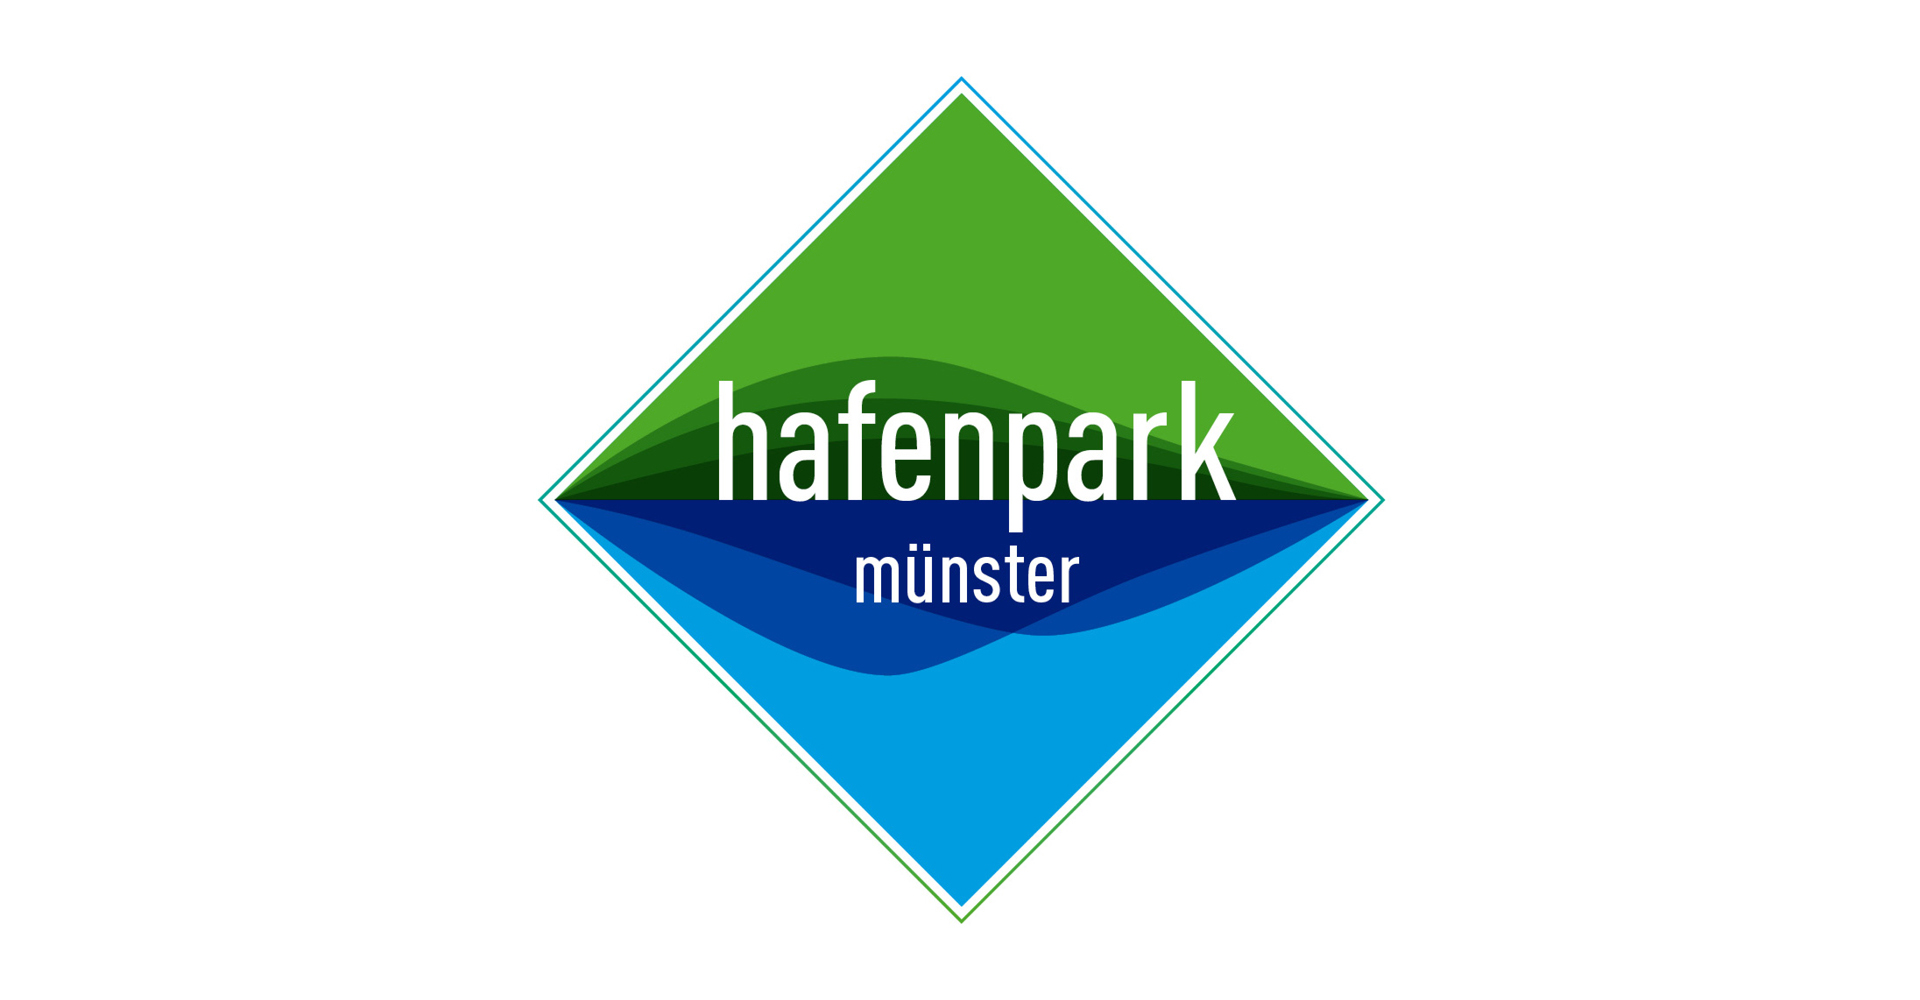 Logo-Design, hafenpark, Design, Logo, Münster, Grafik, Studio, Auckz